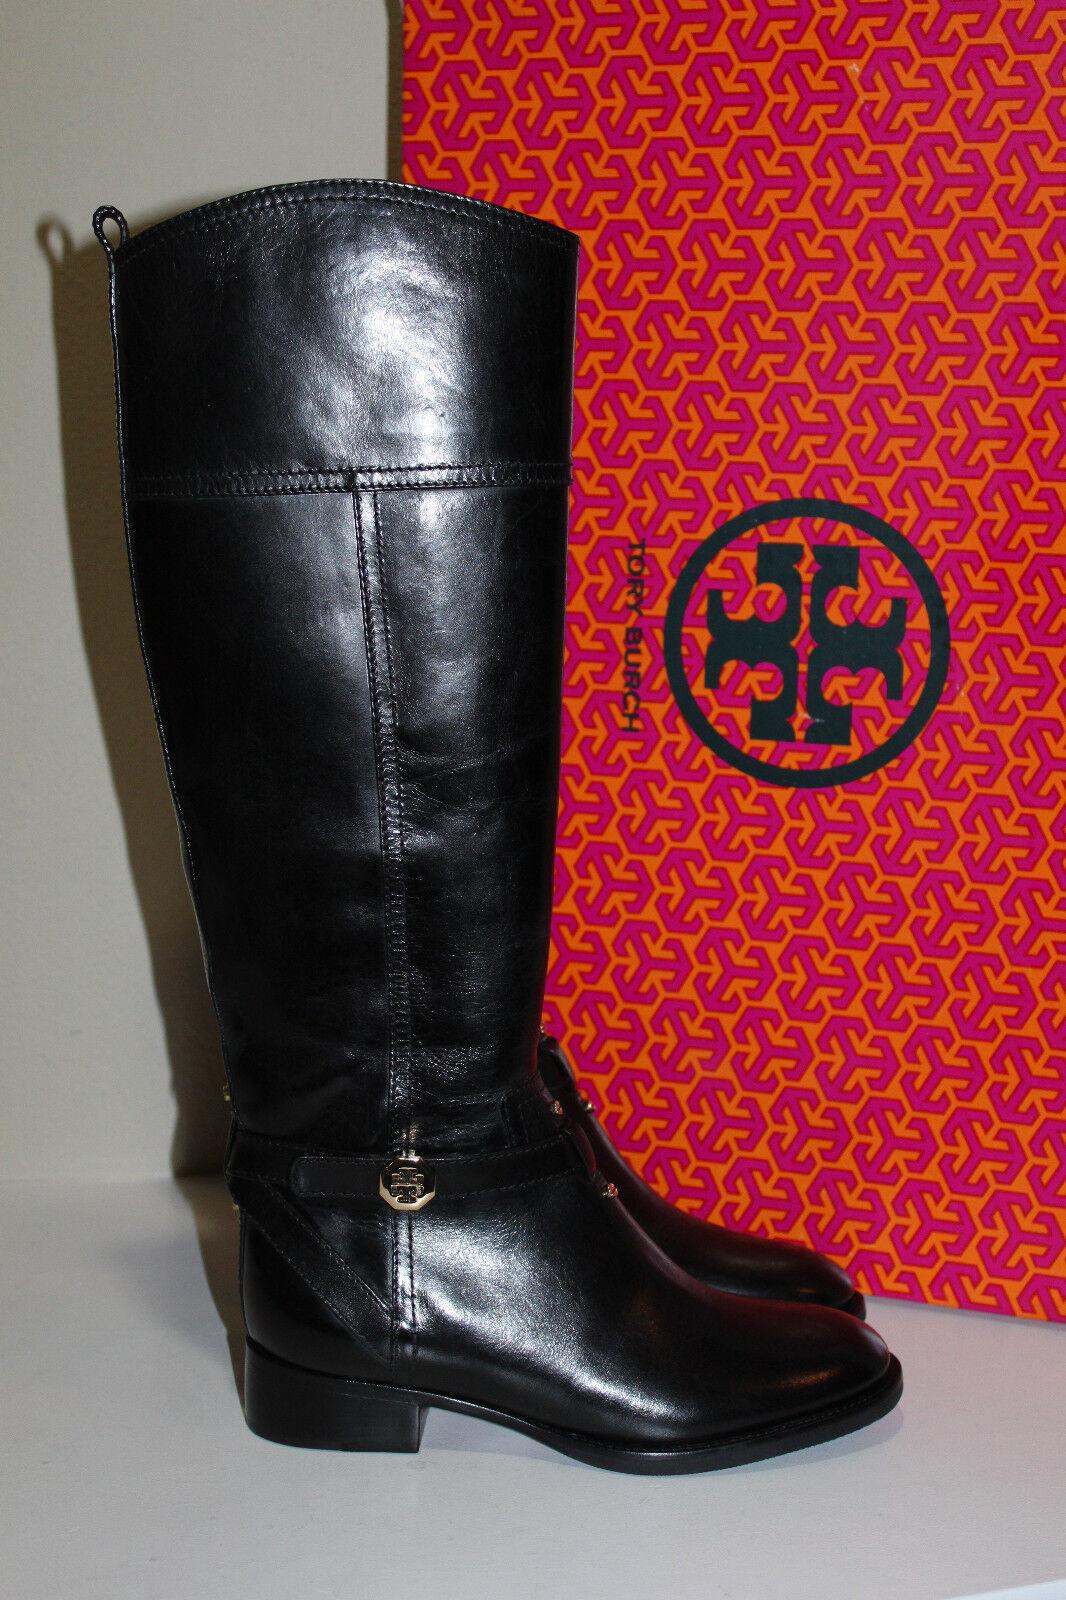 New sz 5 Tory Burch Brita Black Leather Gold Logo Riding Knee High Boot Shoes